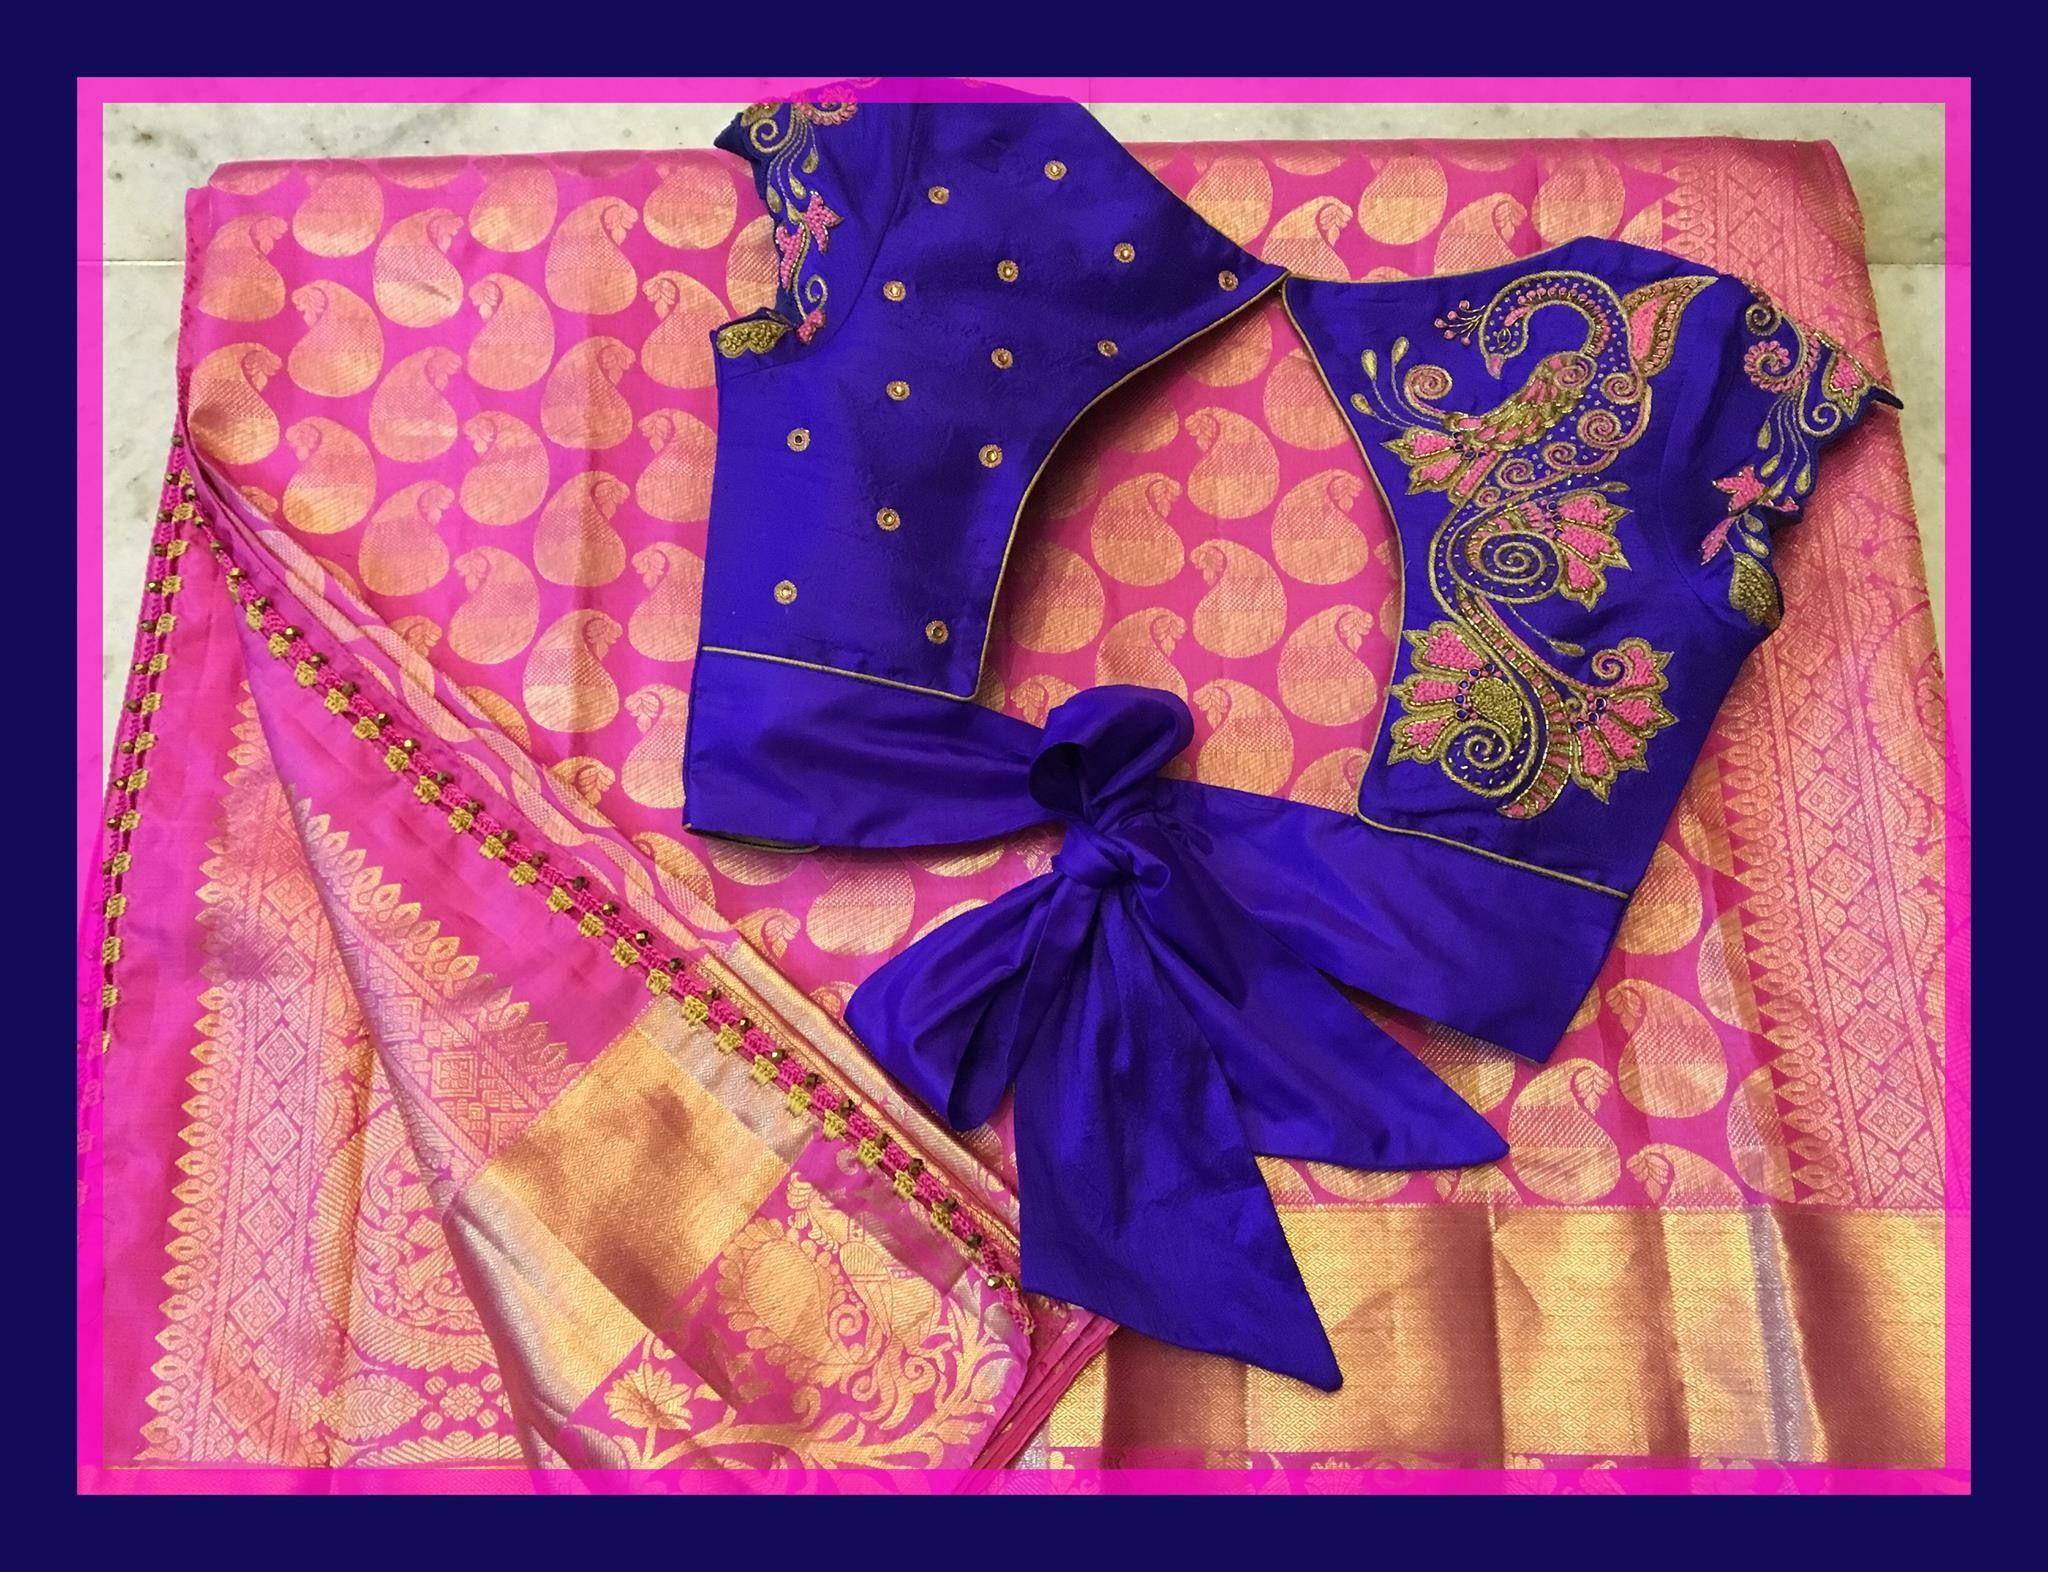 Pin by neethashyni neethashyni on saree pinterest blouse designs